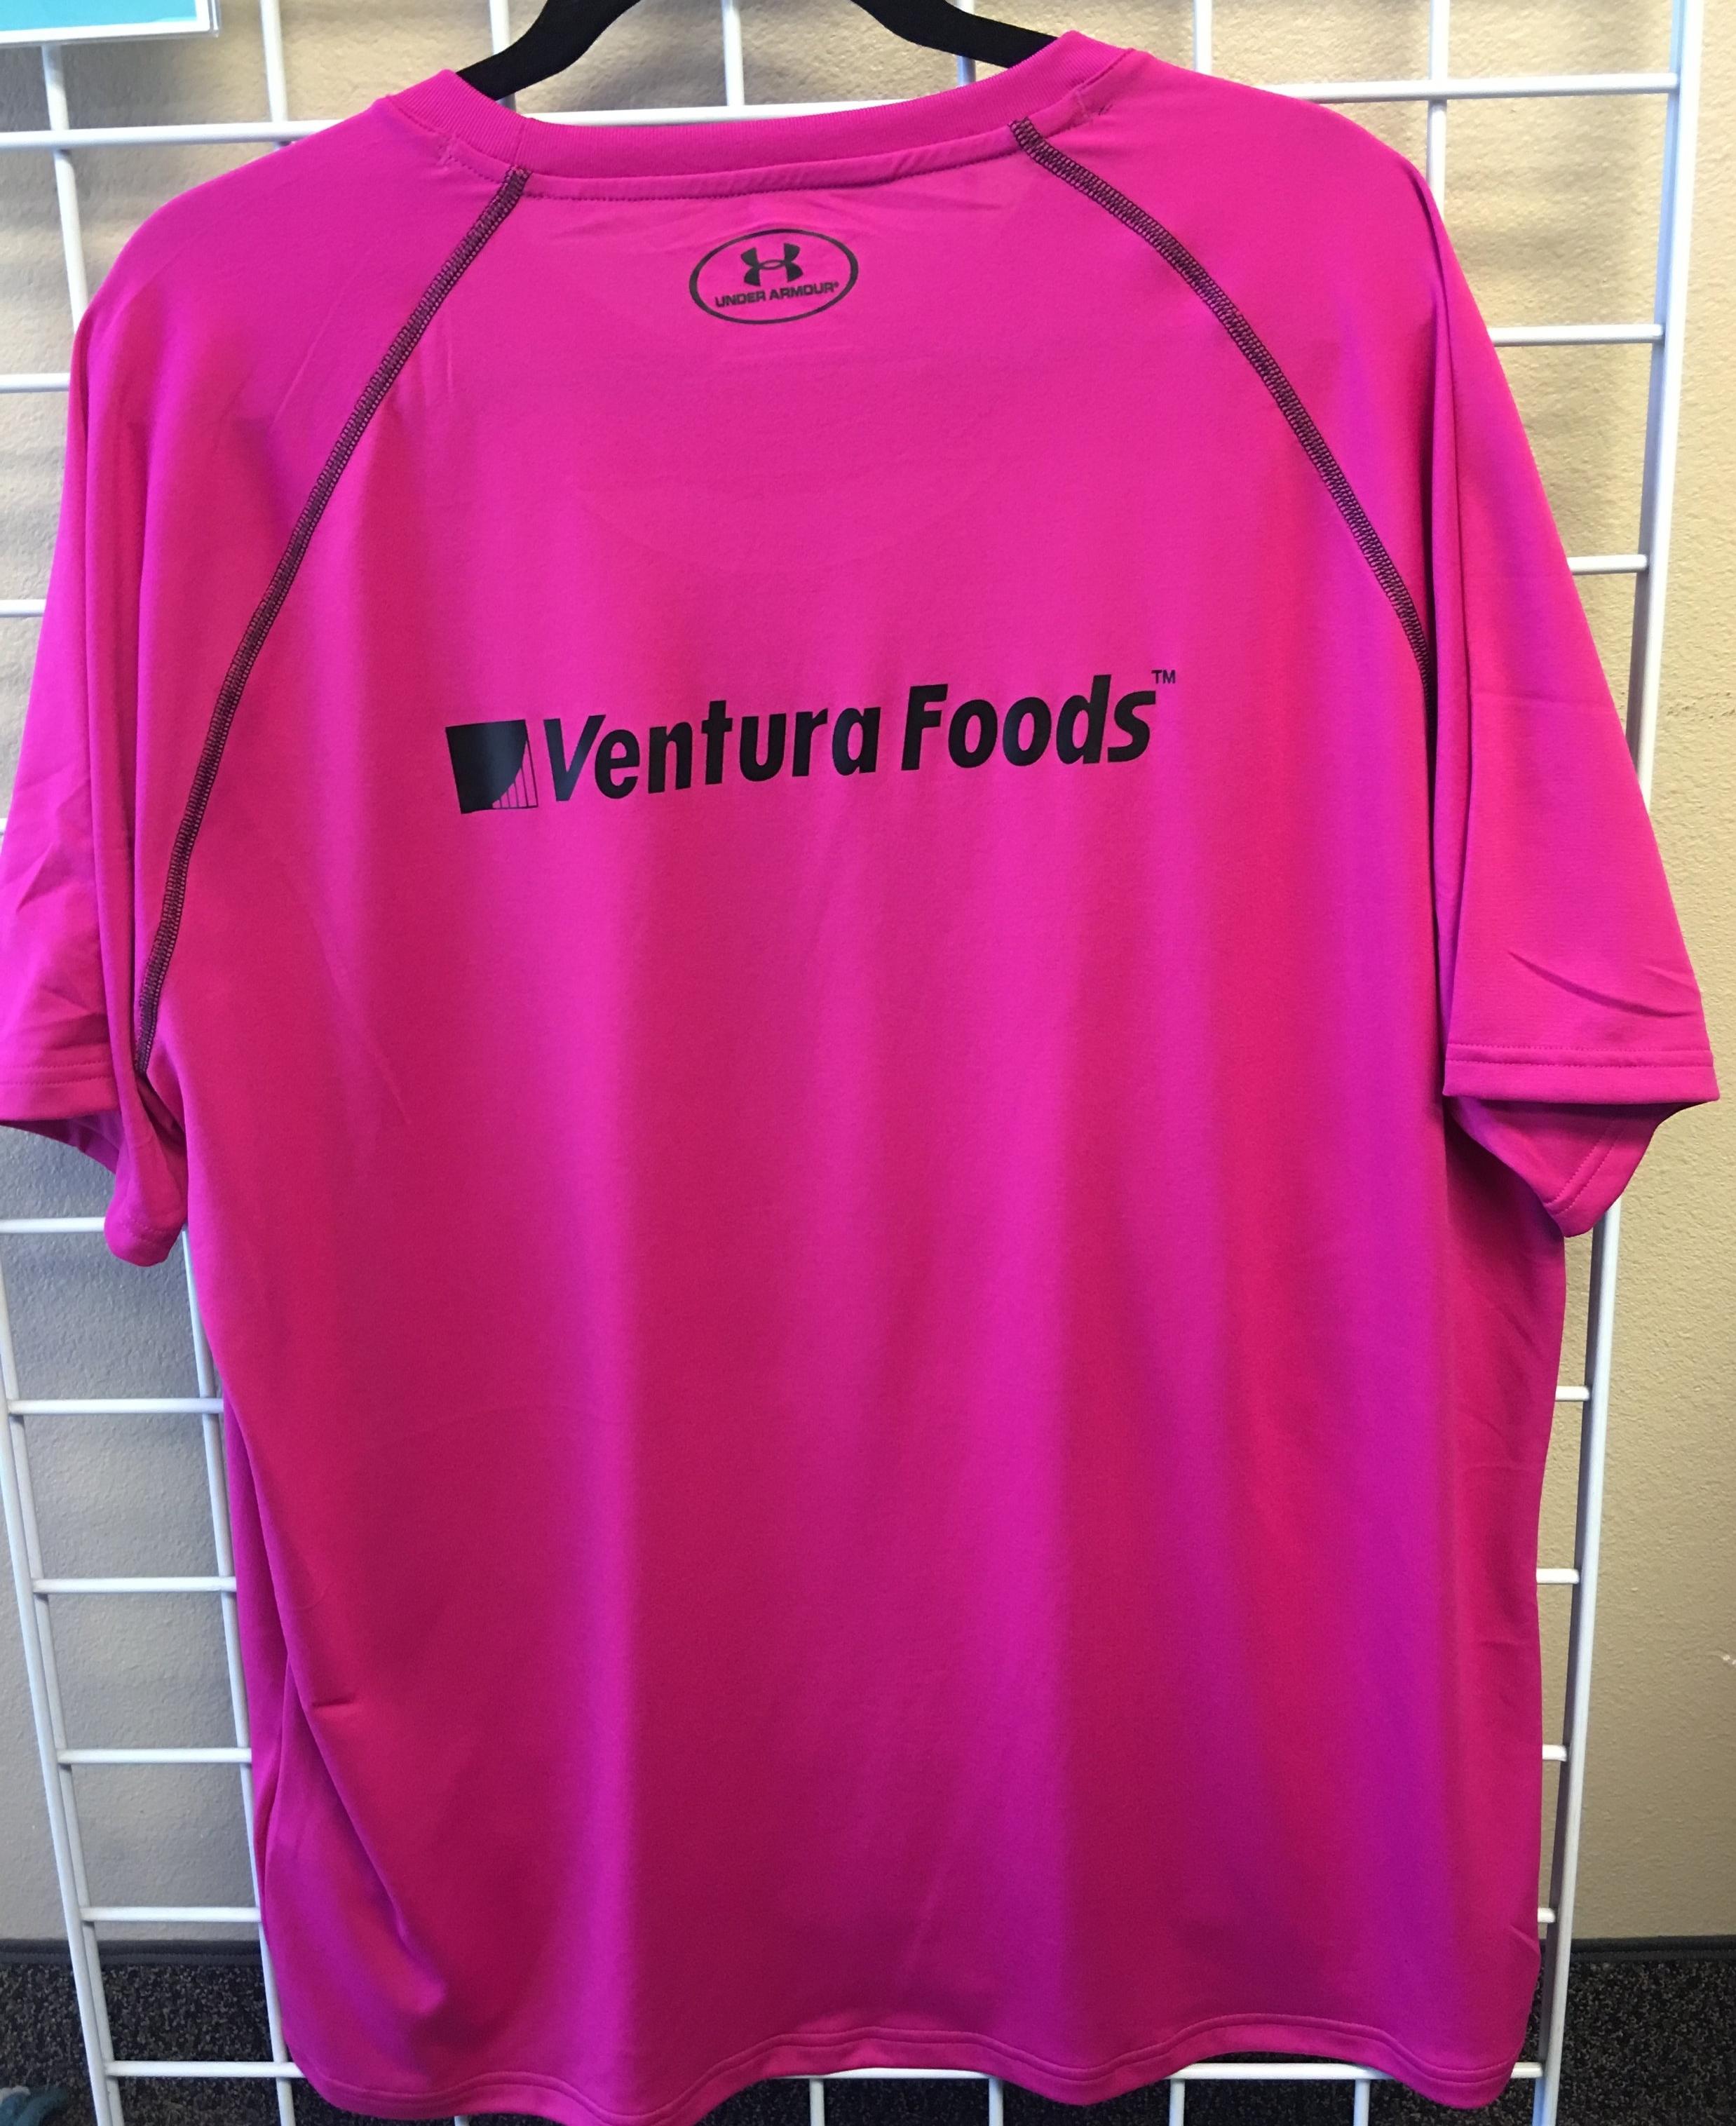 Custom Drifit Tees Sponsored by Ventura Foods - Saucy Pink Ninjas